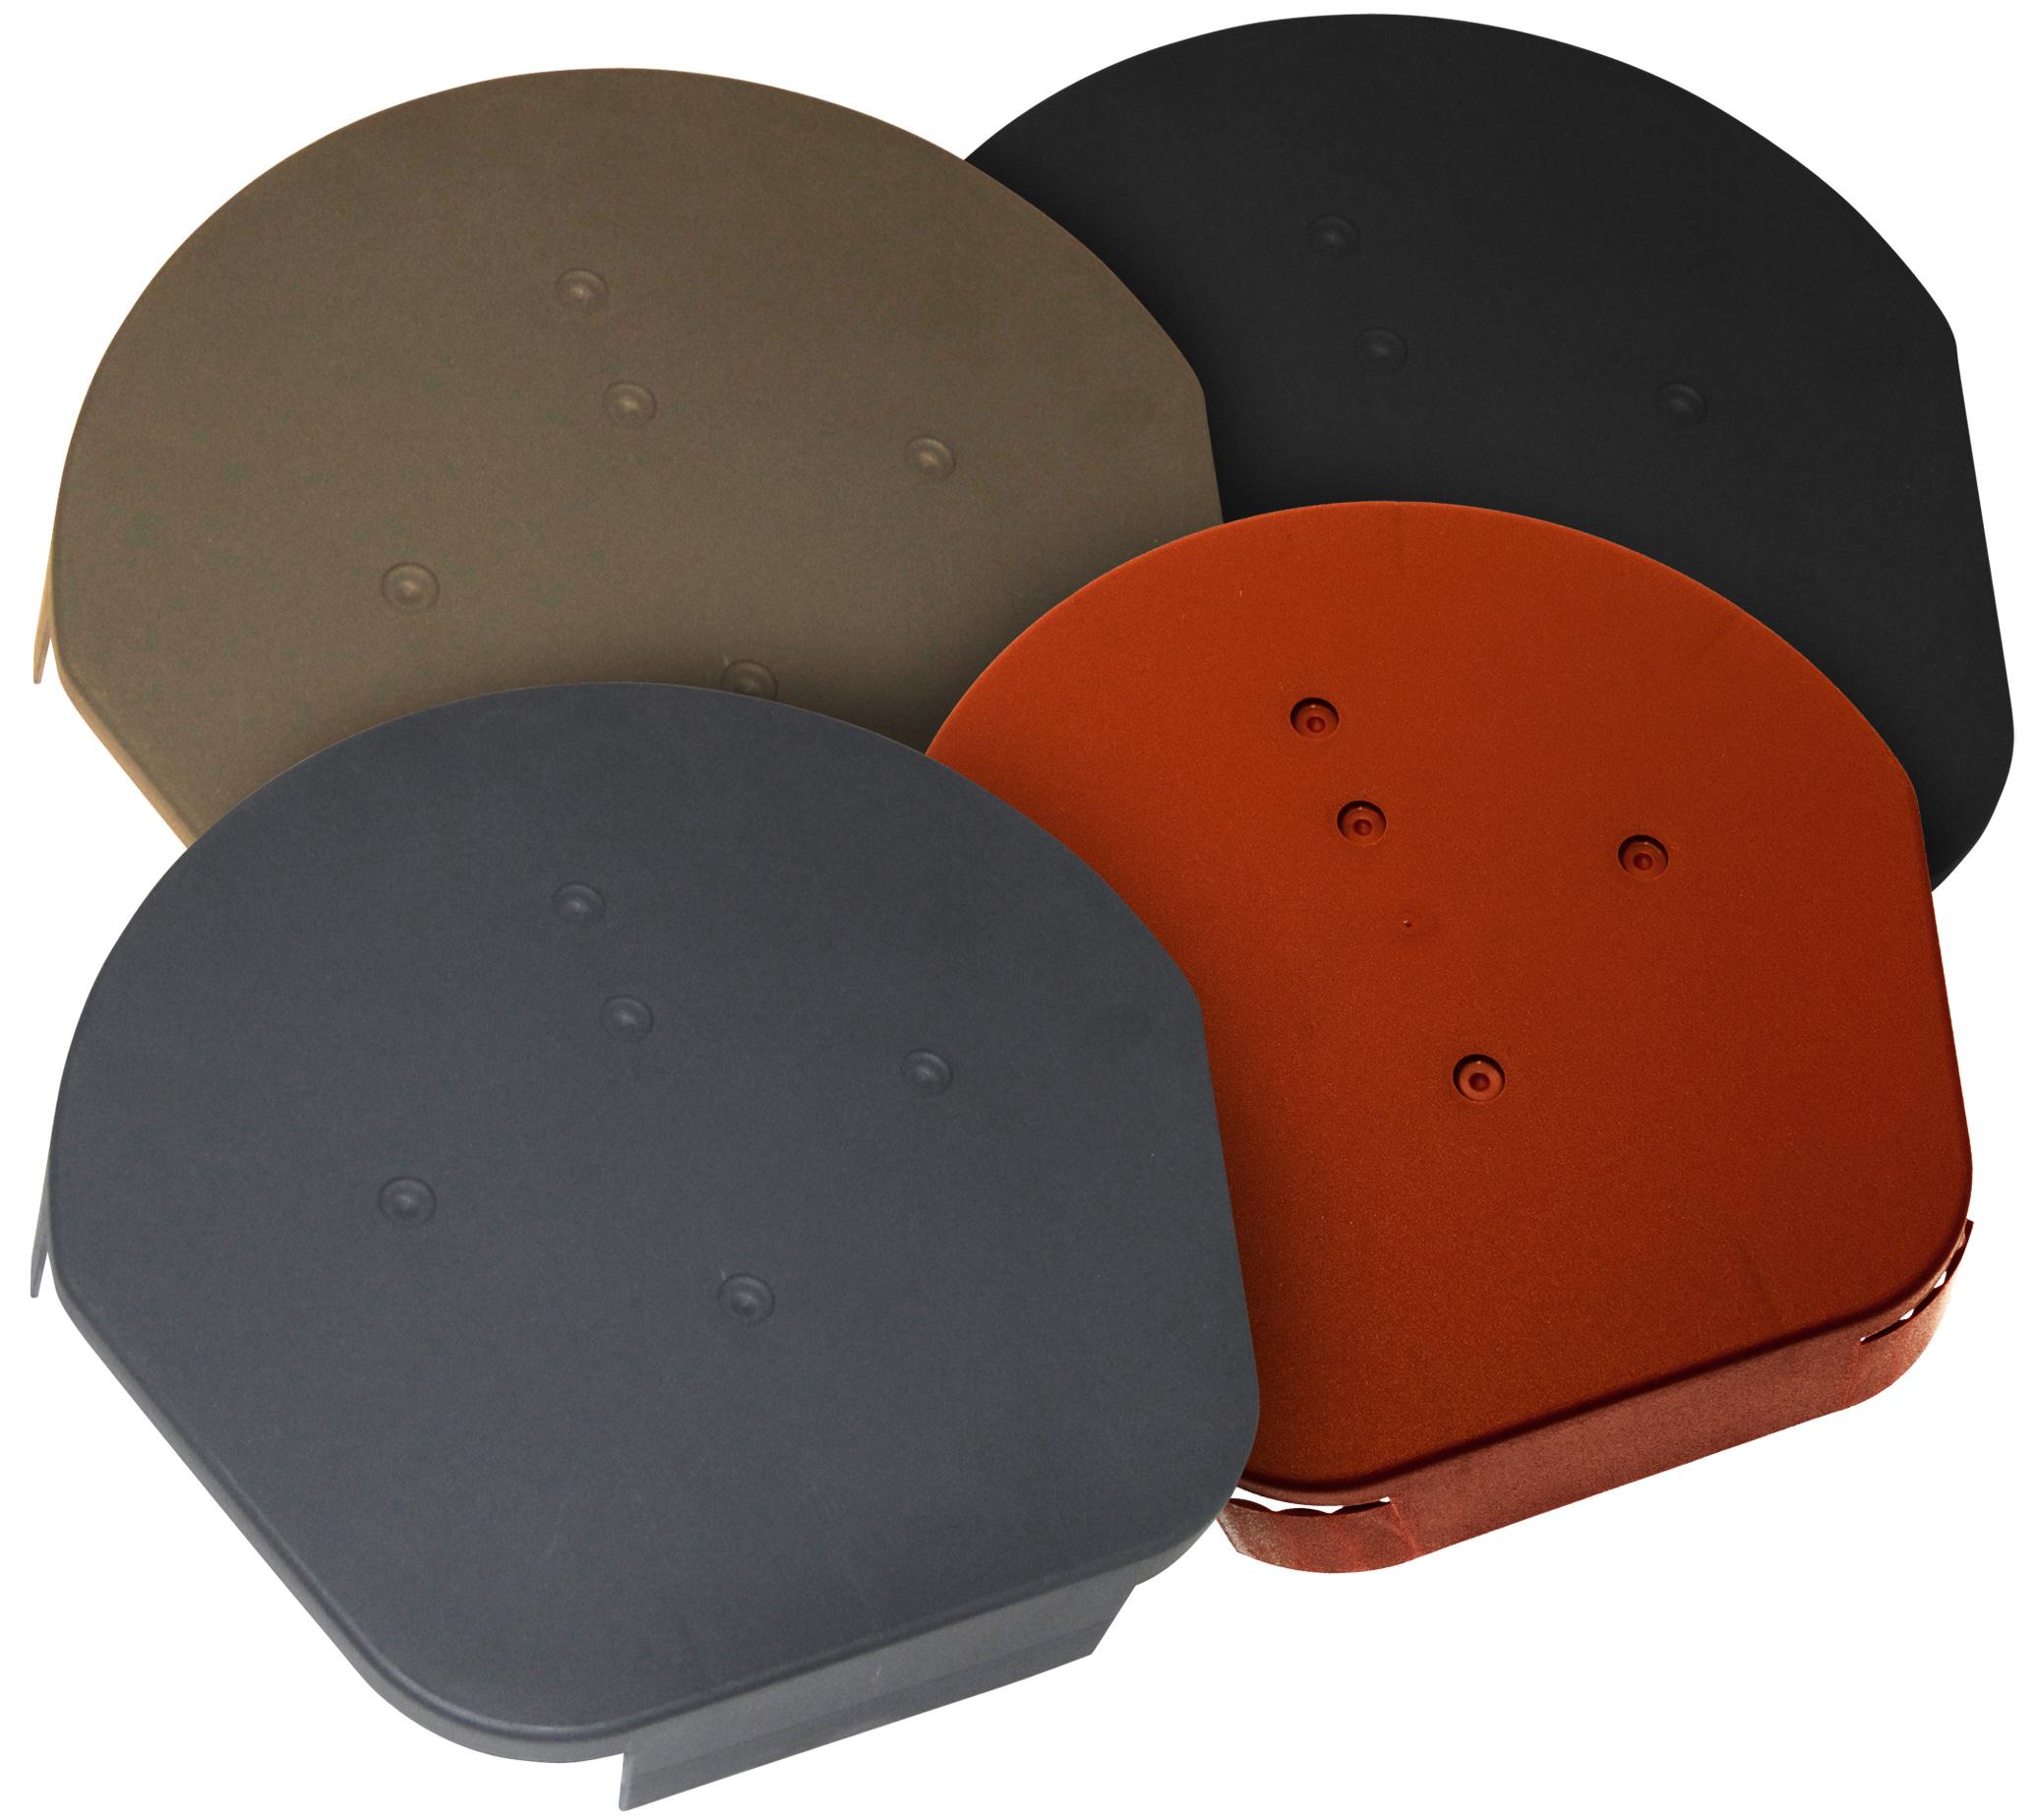 Easyverge U Dry Verge Roof System Half Round Ridge Apex